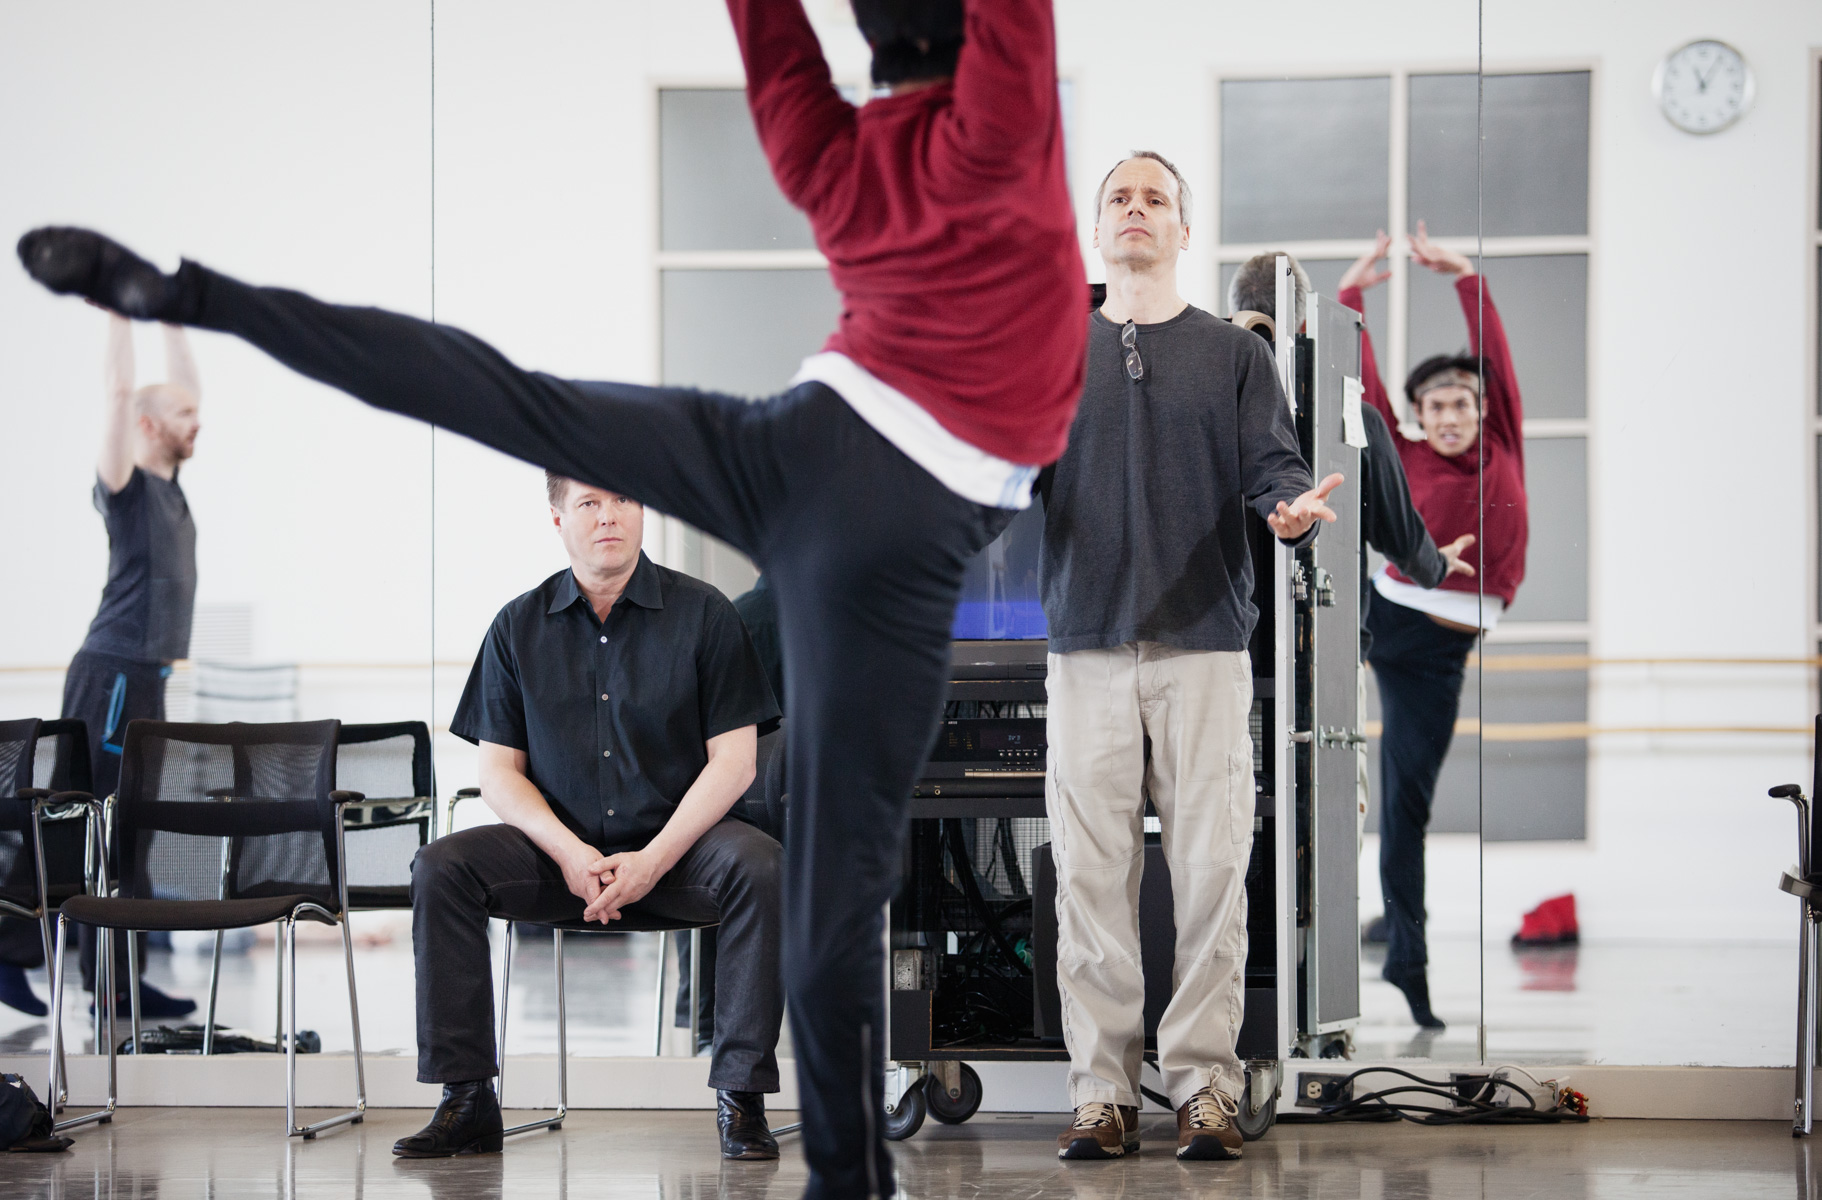 blo-ballet-audition-1.jpg